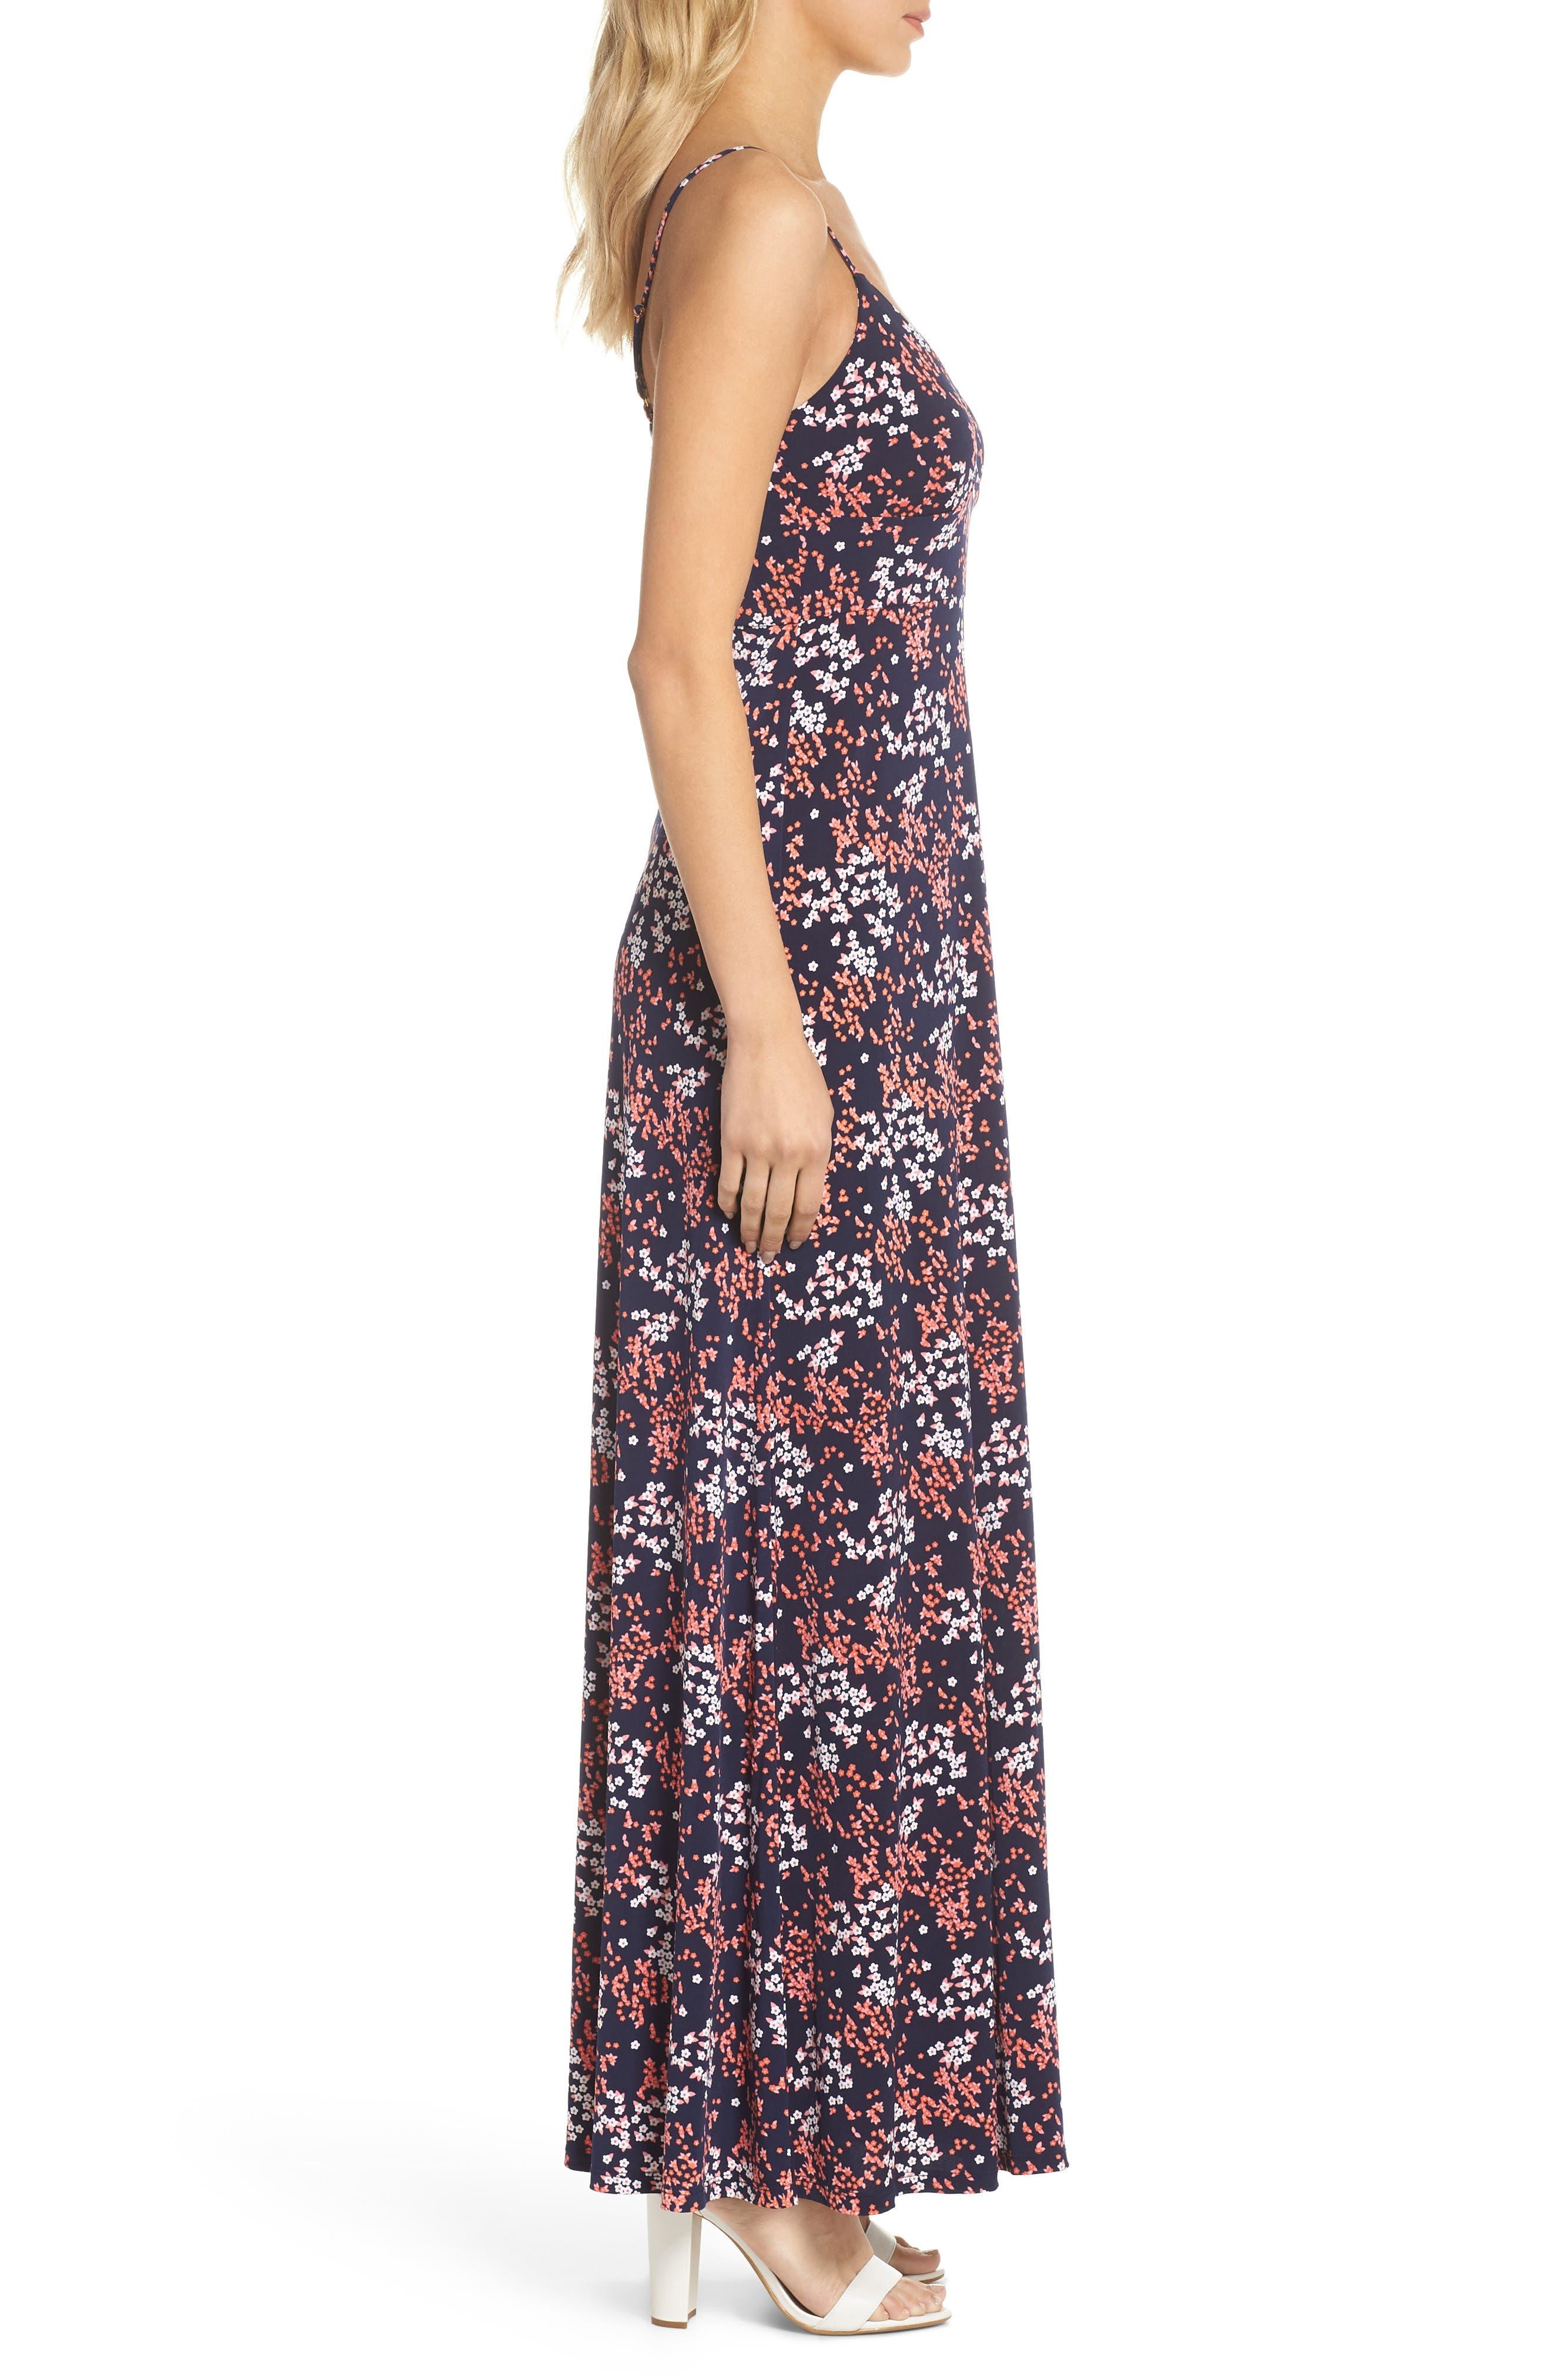 Bloom Maxi Dress,                             Alternate thumbnail 3, color,